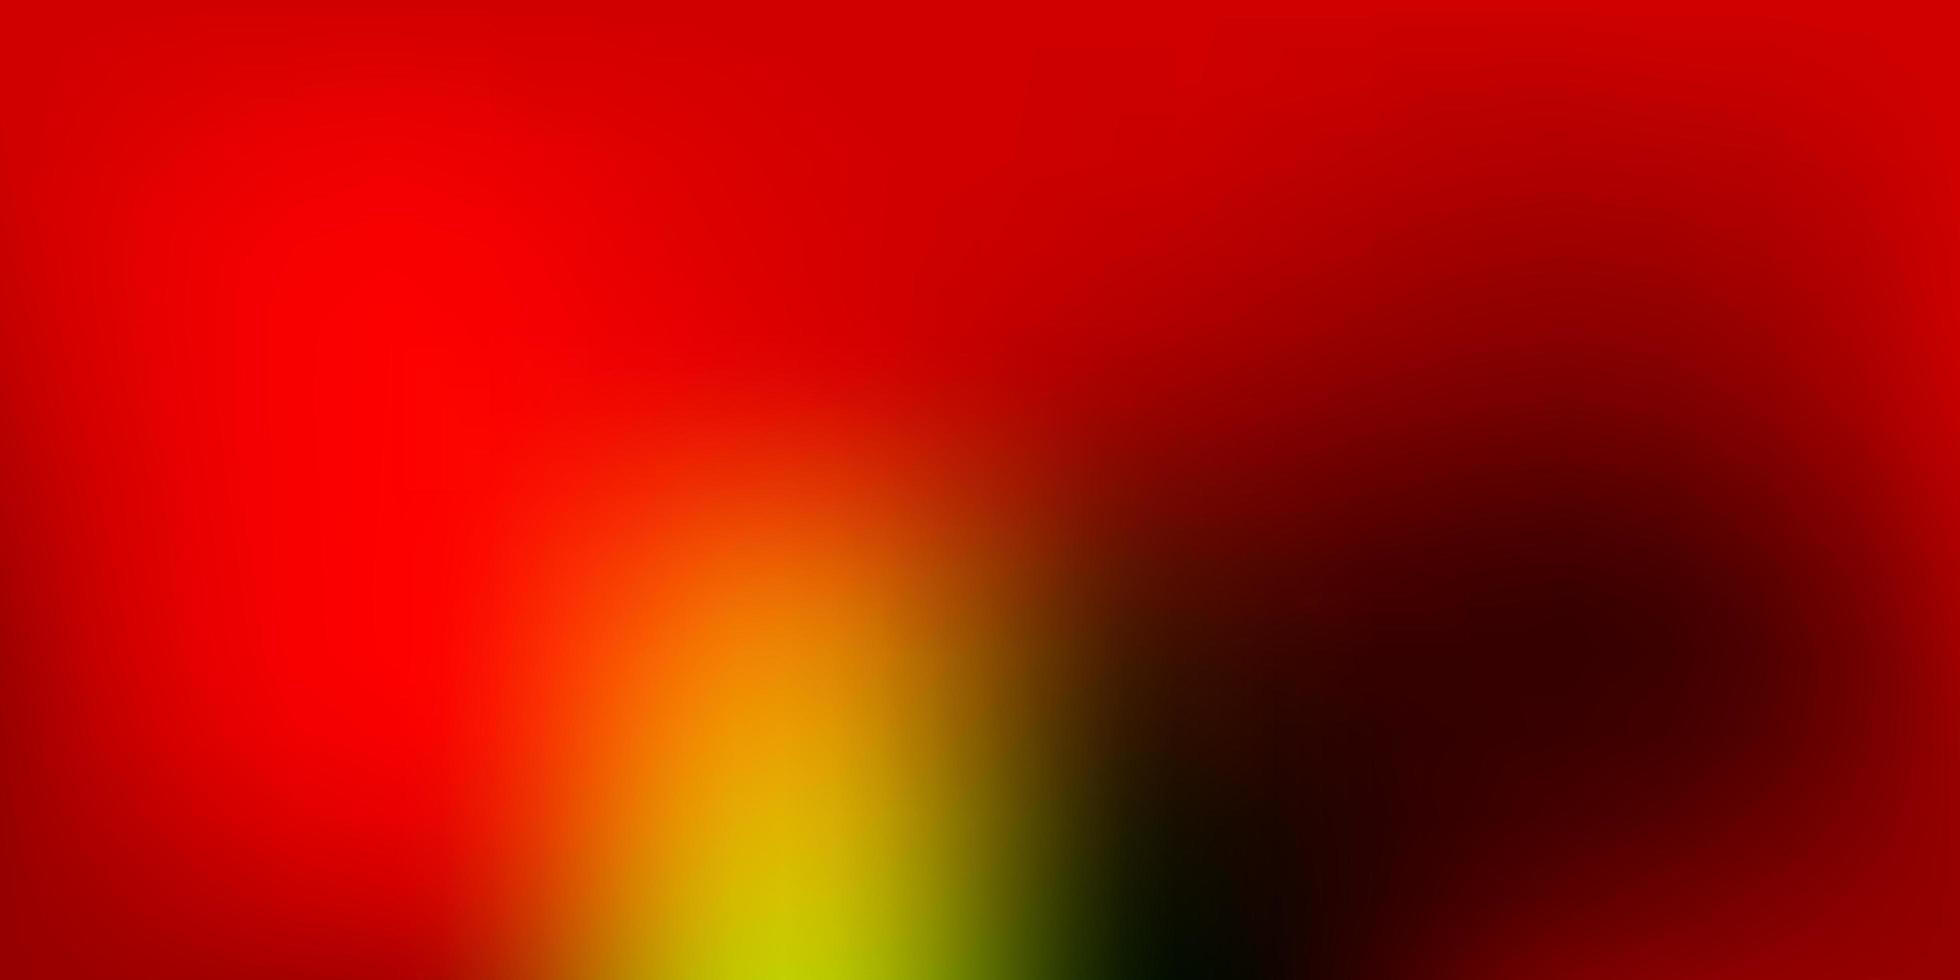 dunkelgrünes, rotes Vektorgradienten-Unschärfelayout. vektor